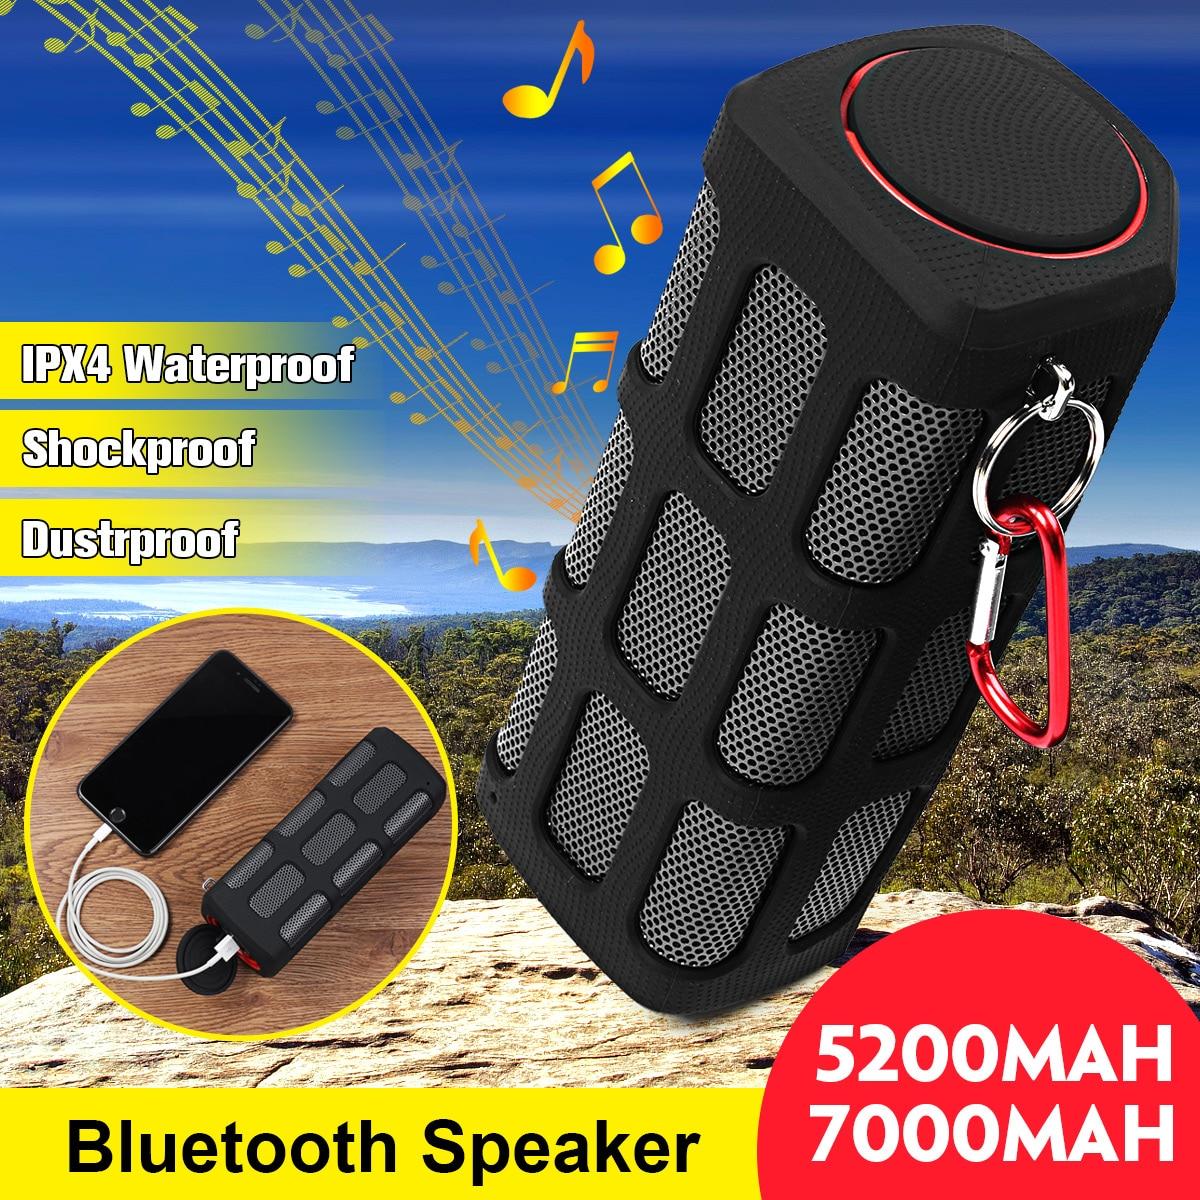 цена на 5200mAh/7000mAh Waterproof Outdoor Bluetooth Speaker Wireless Portable Shockproof Dustproof Power Bank Sport Speakers Subwoofer